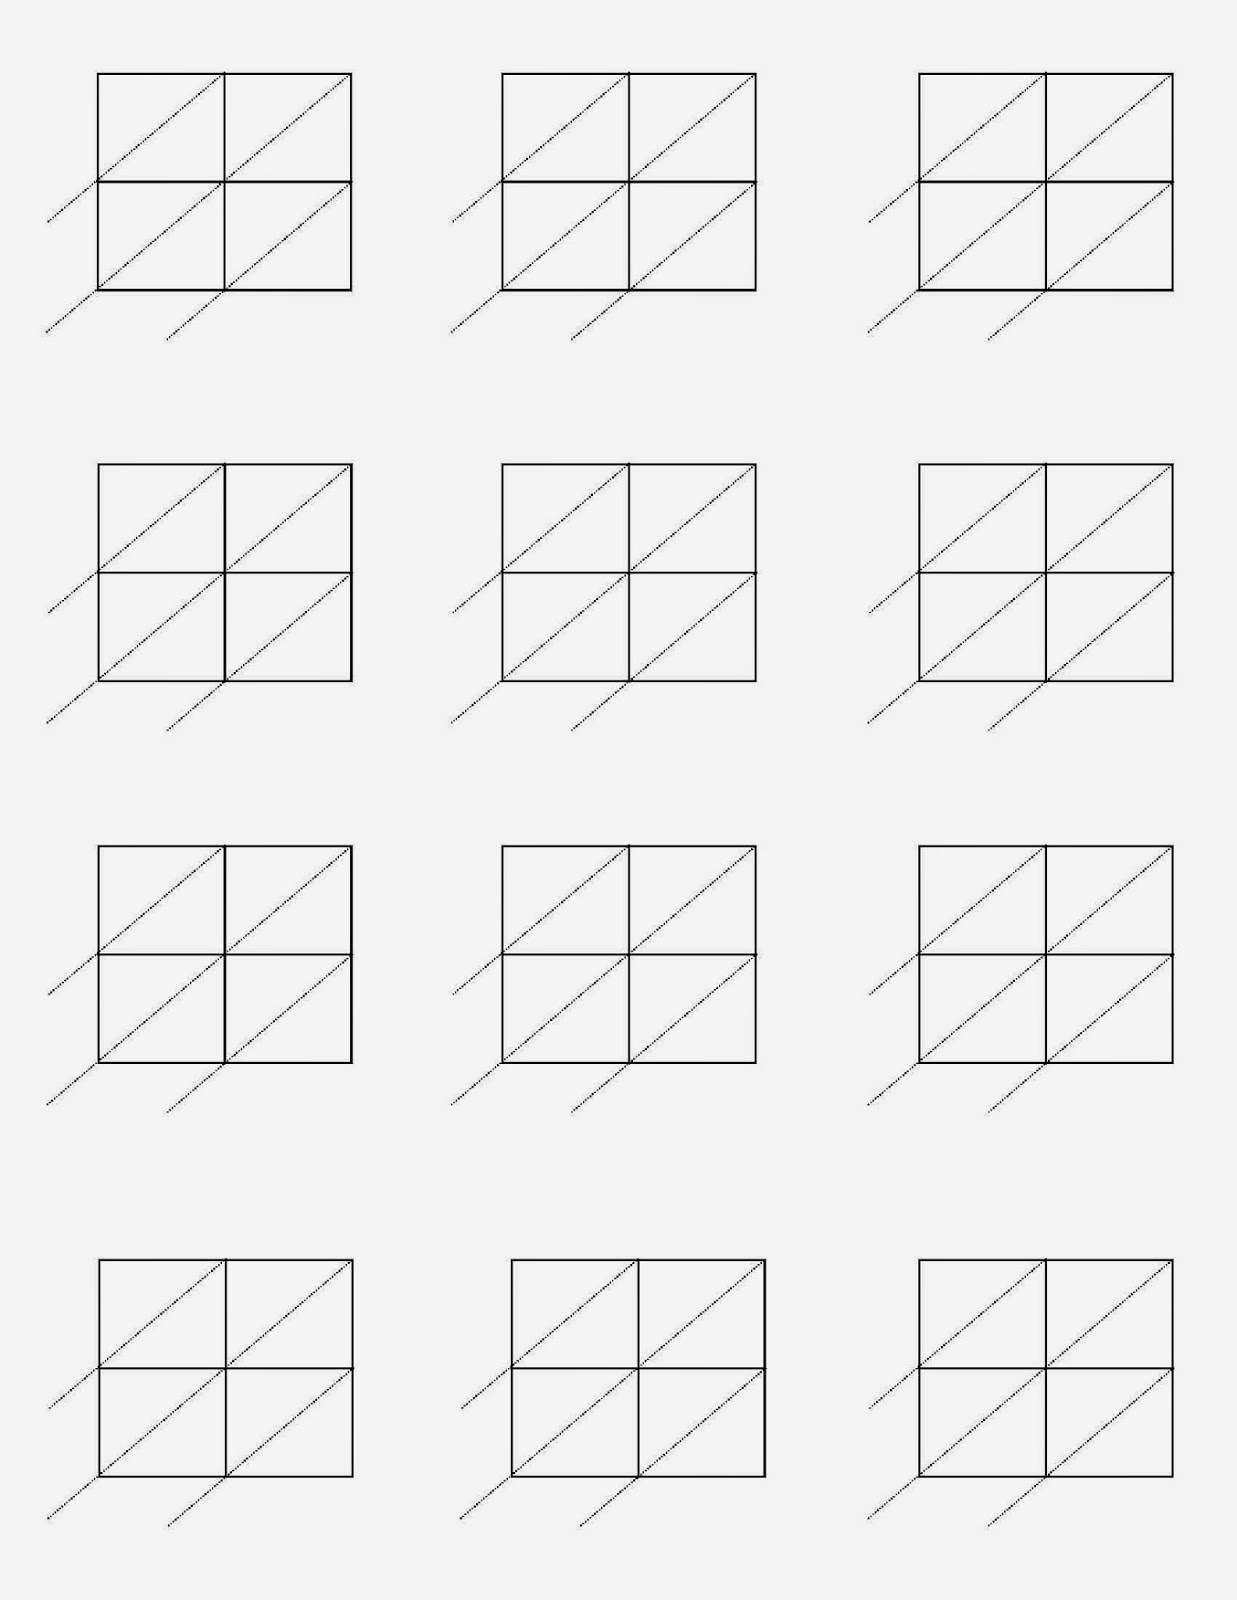 Blank Lattice Multiplication Worksheets Lattice Multiplication – Lattice Method of Multiplication Worksheets